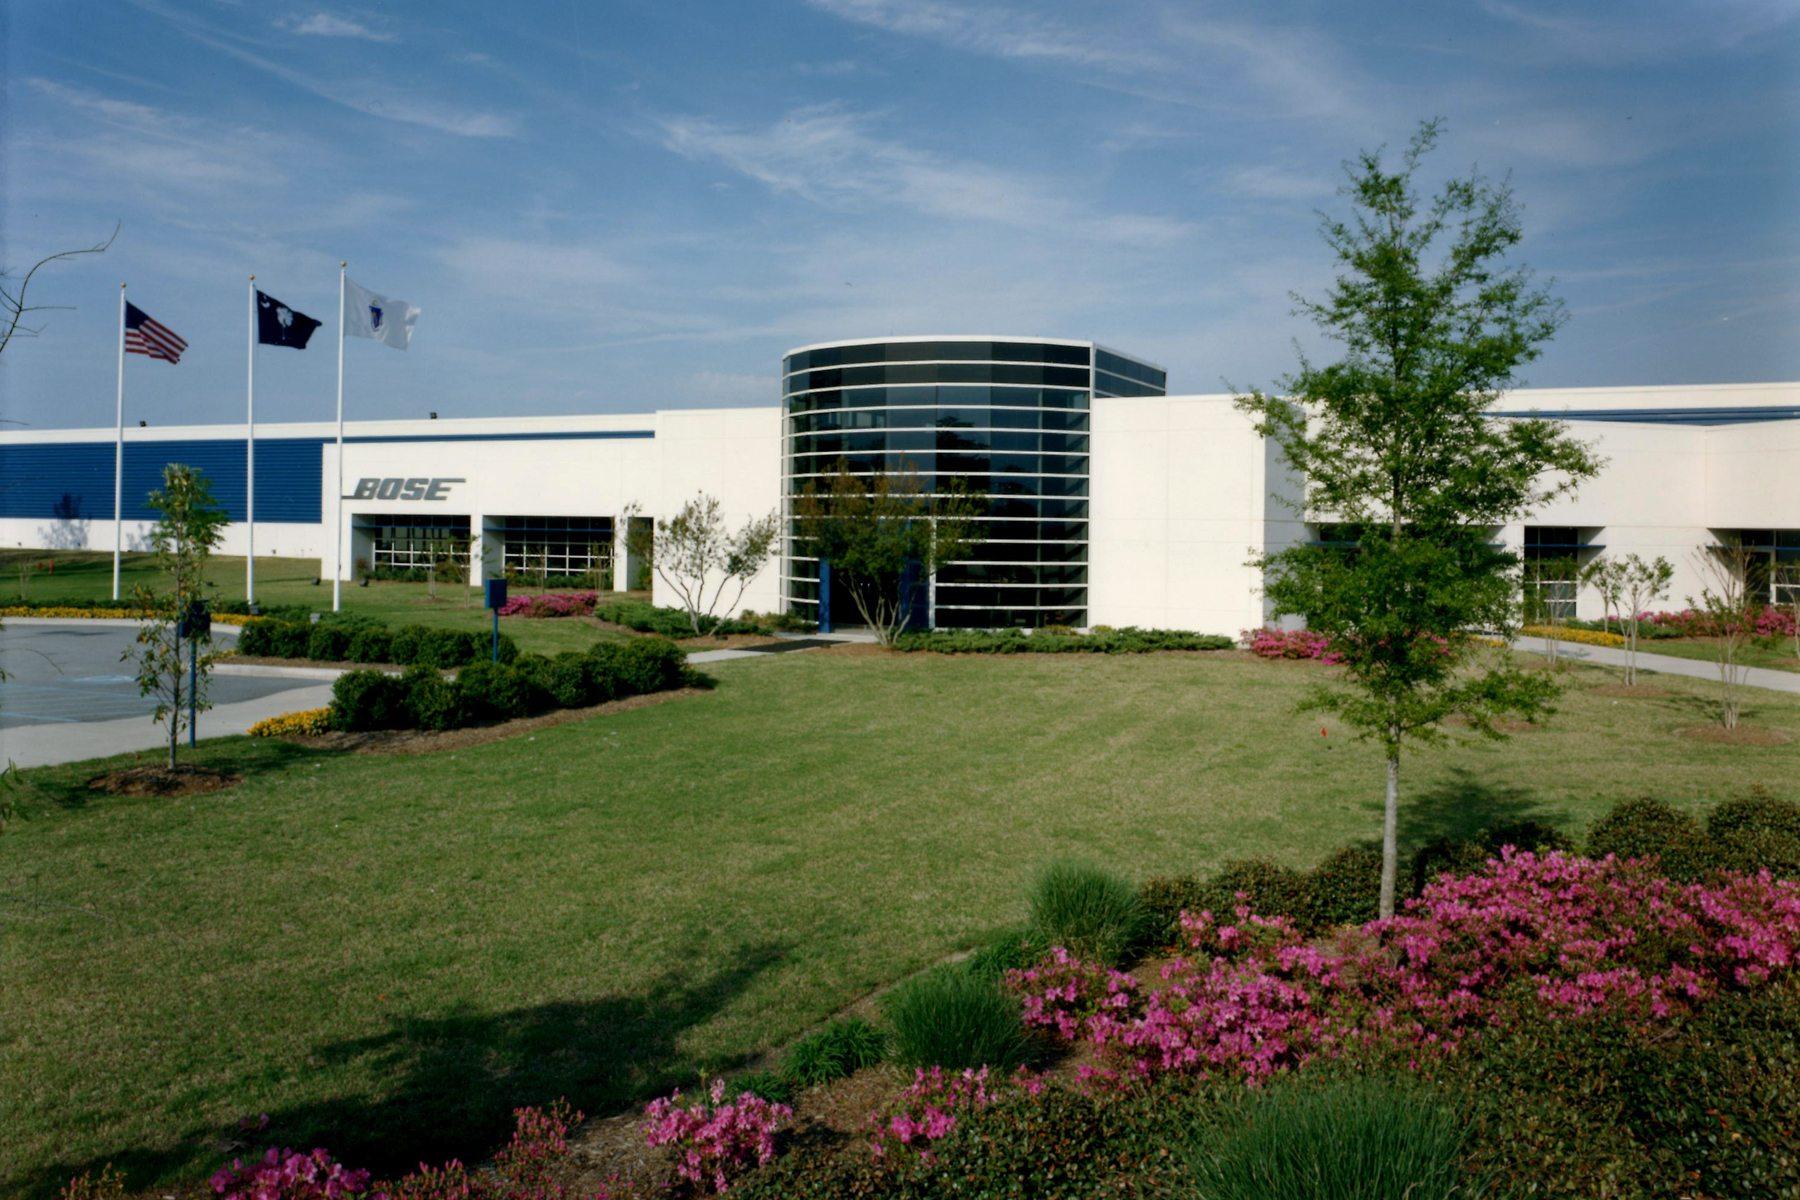 bose corporation headquarters. bose corporation headquarters